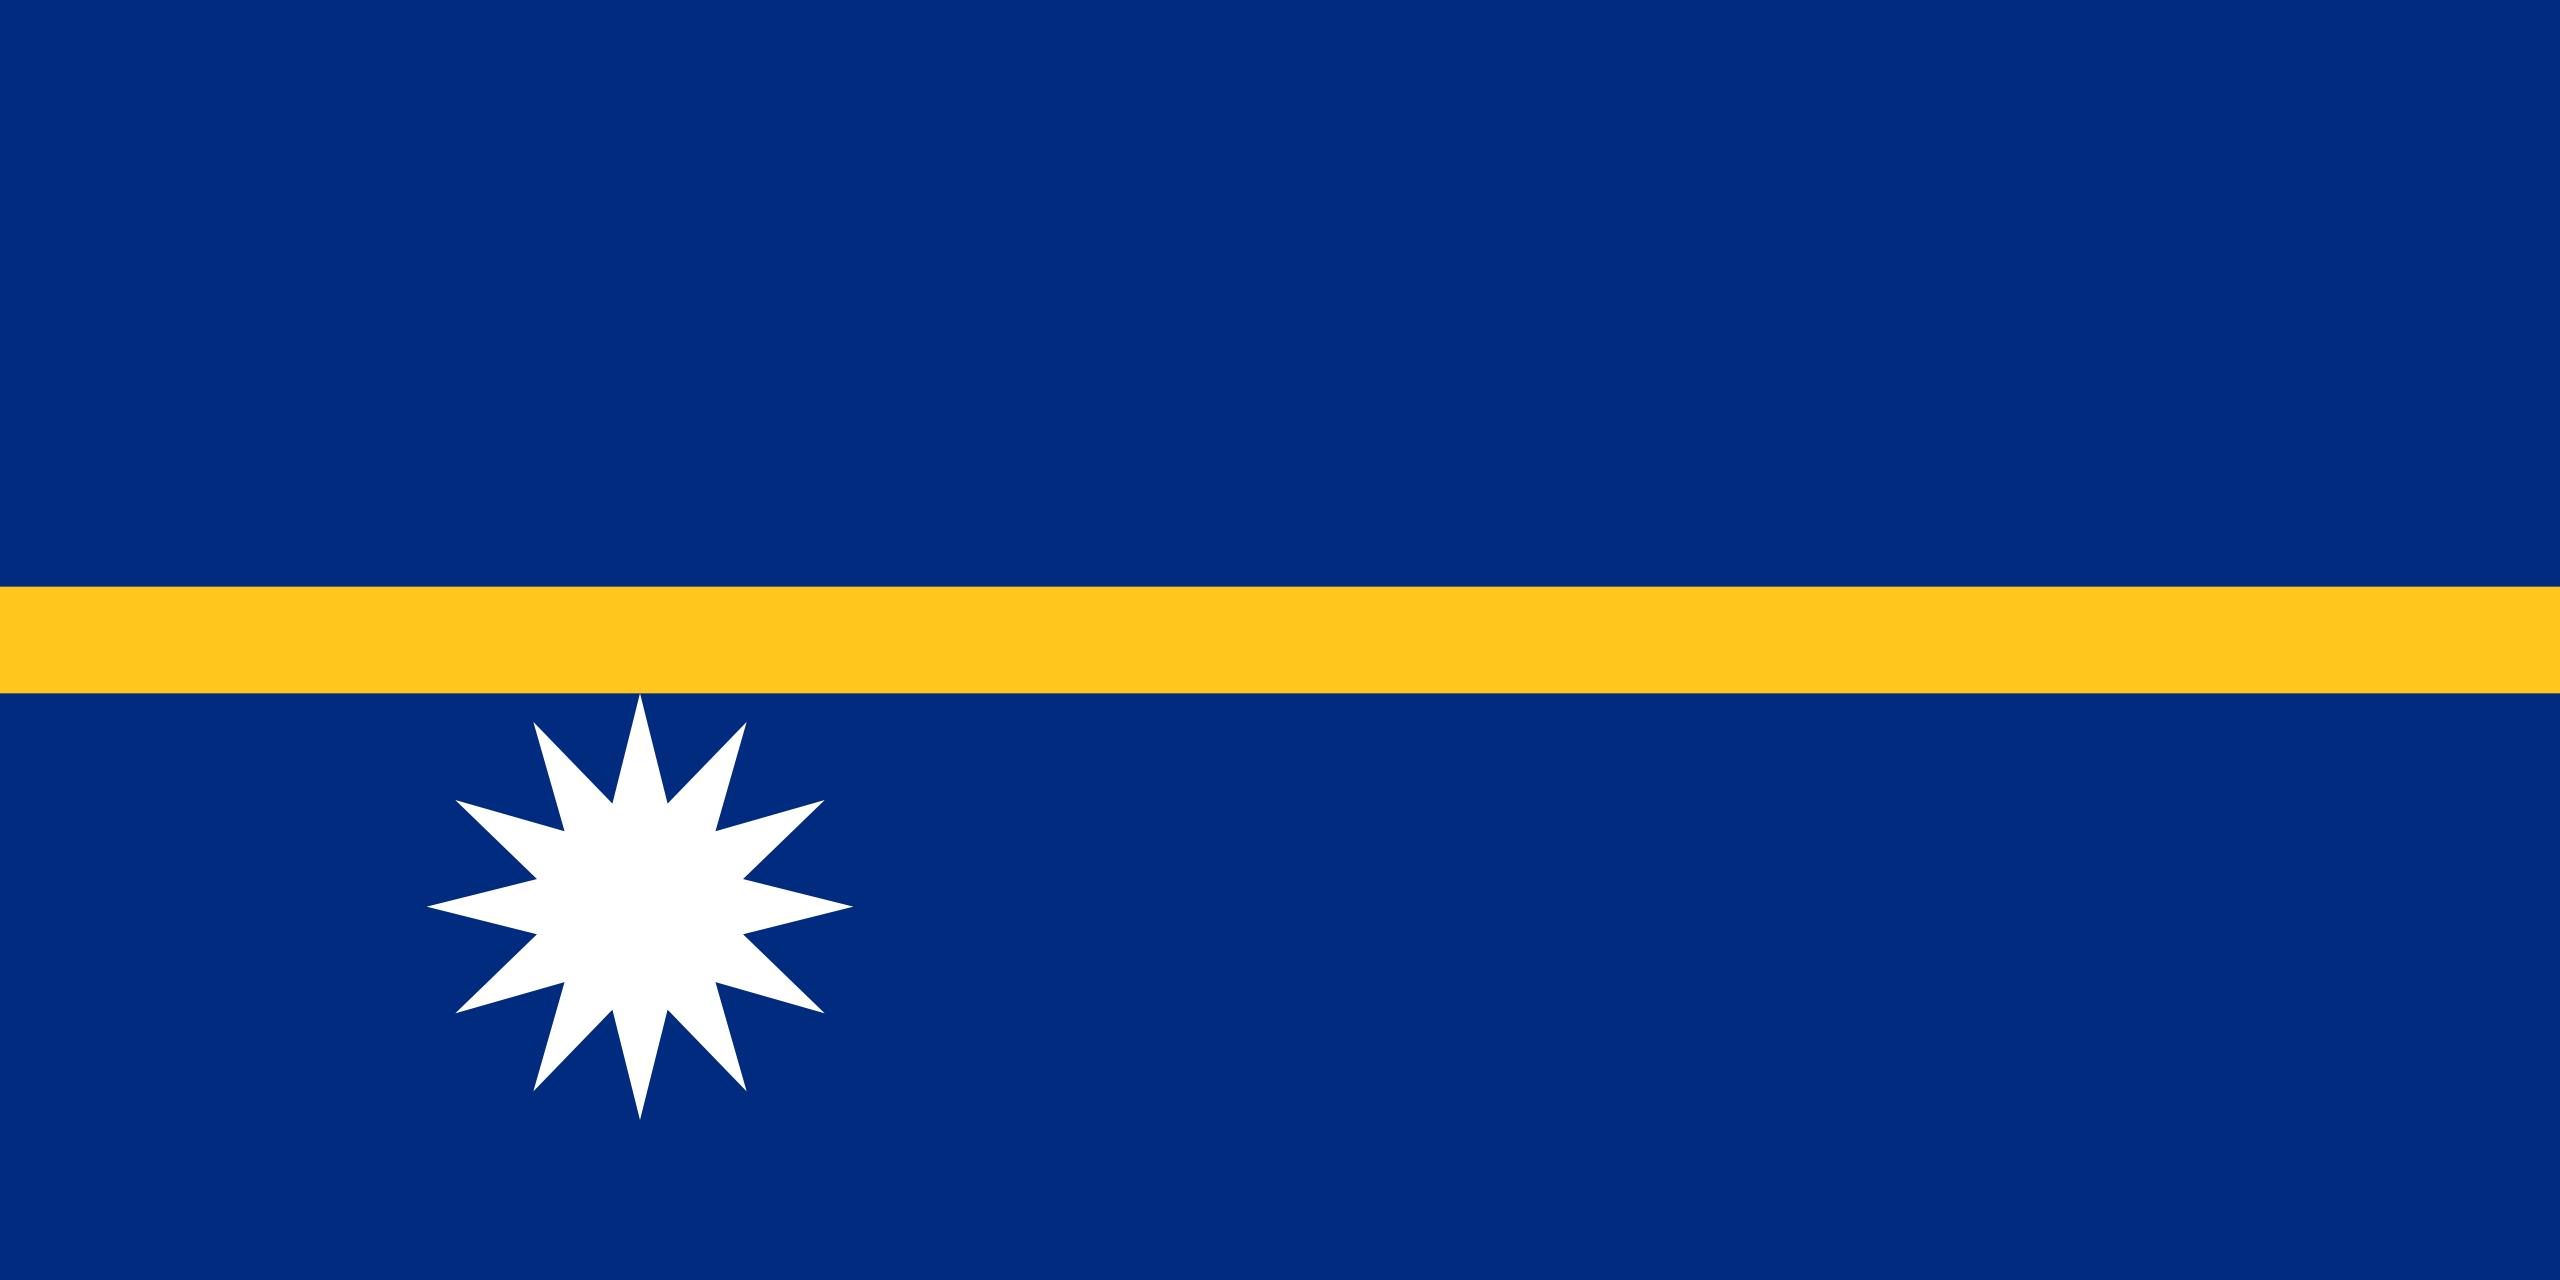 nauru, paese, emblema, logo, simbolo - Sfondi HD - Professor-falken.com